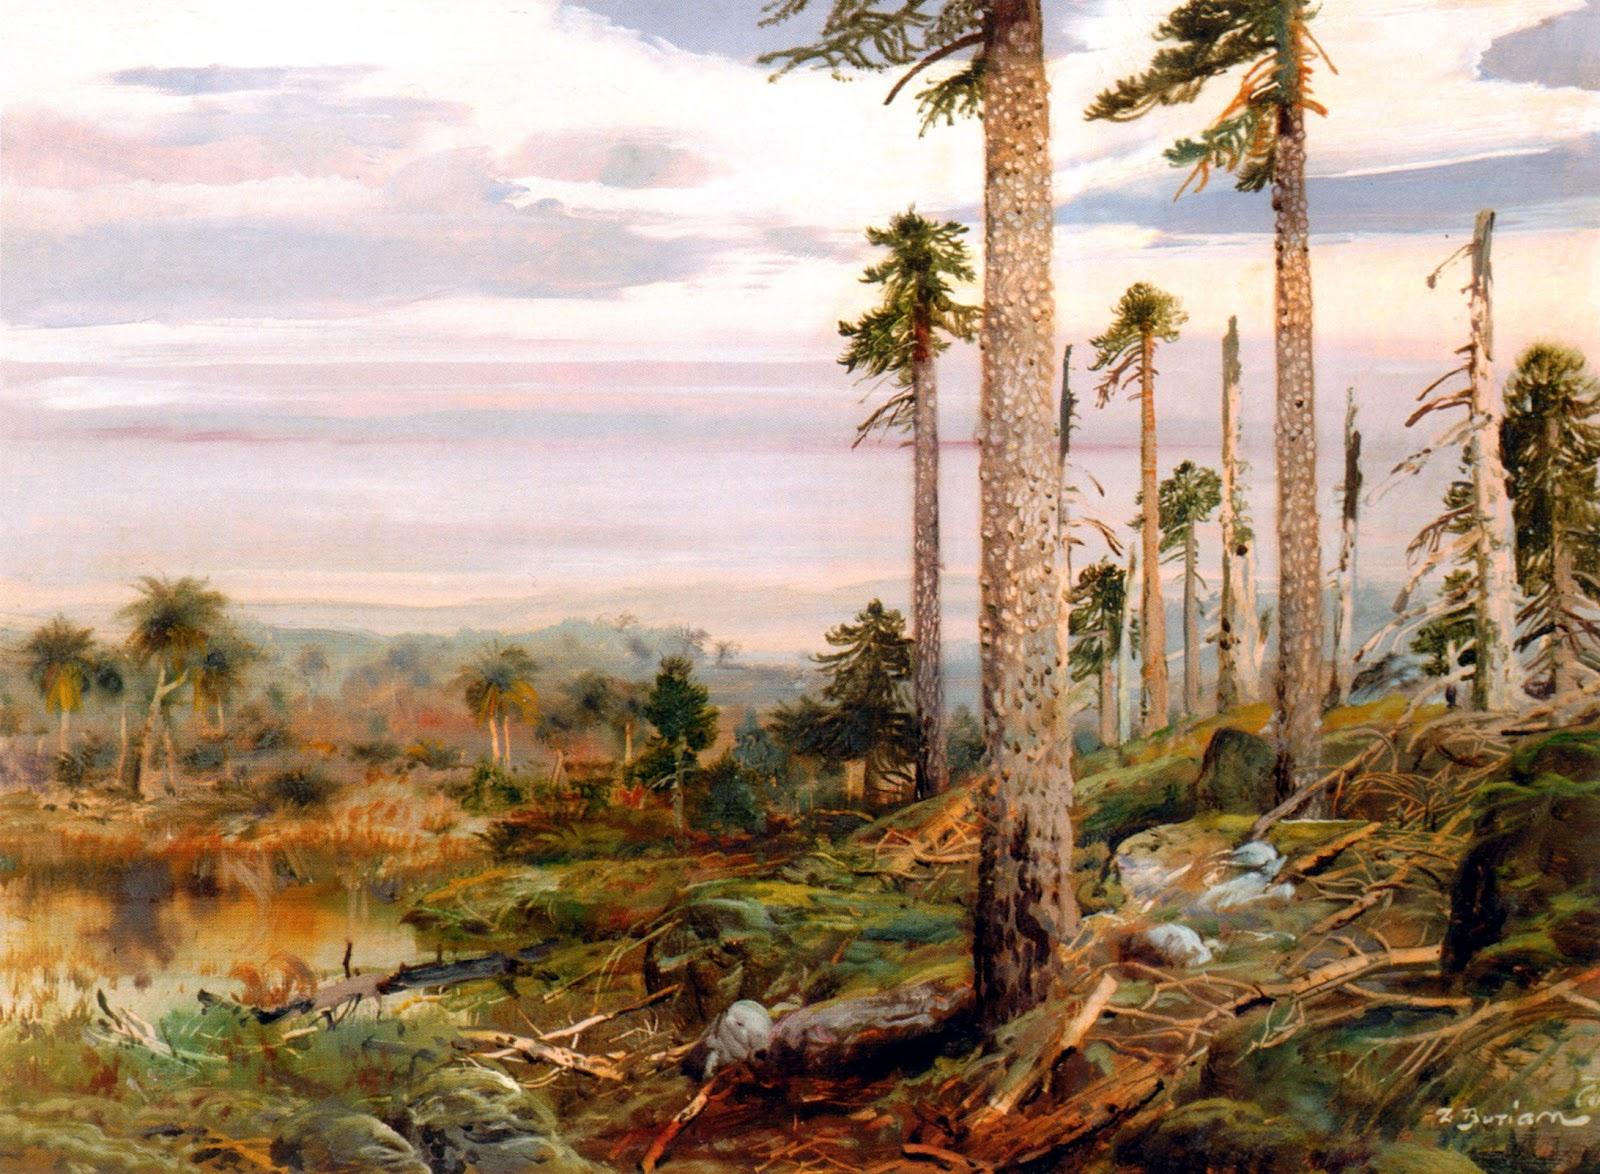 Zdeněk Burian: Jurassic Landscape